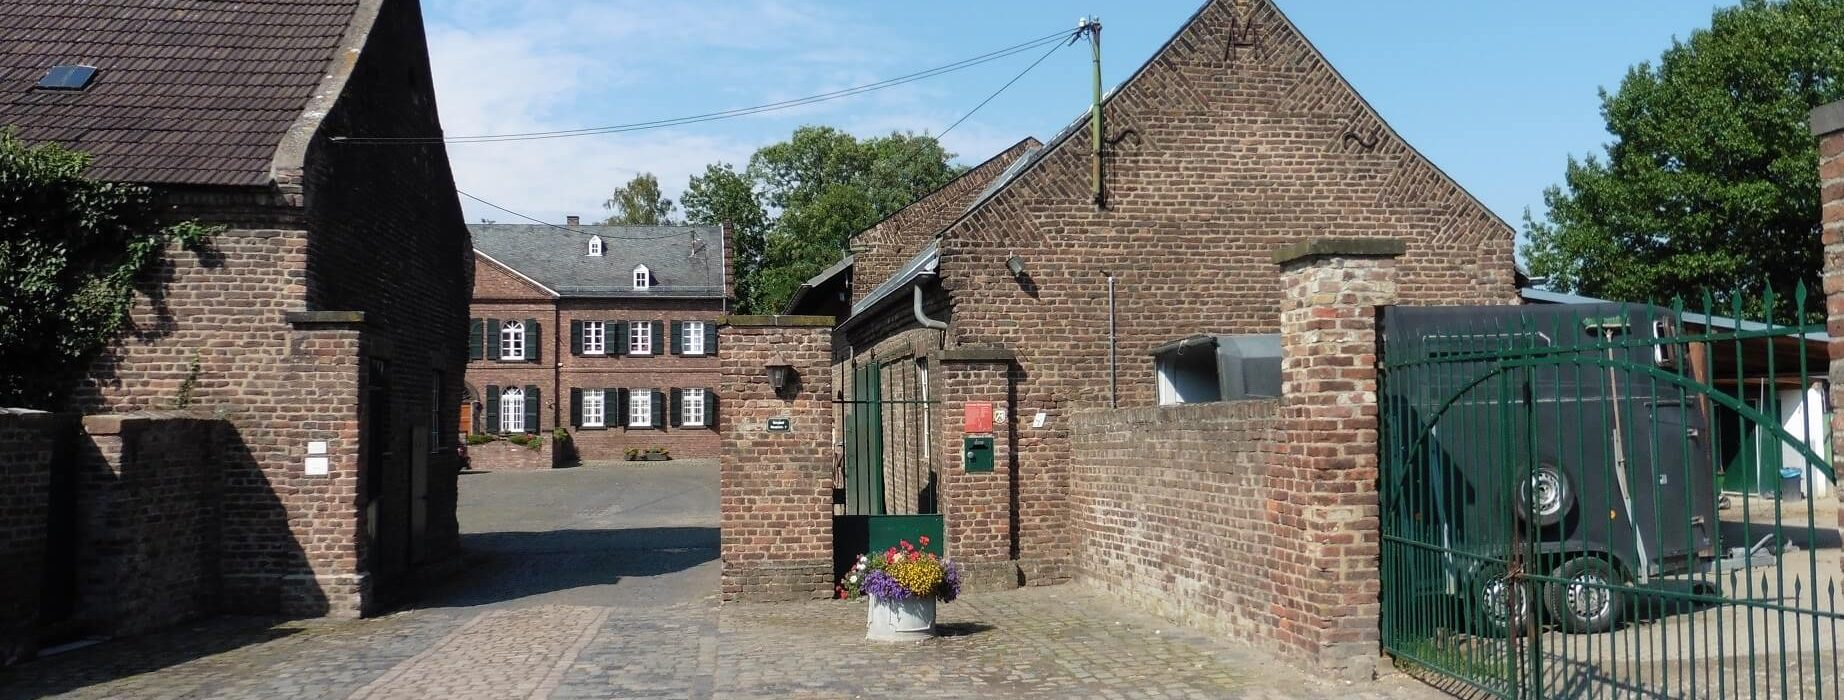 Immobilienmarkt Köln-Widdersdorf